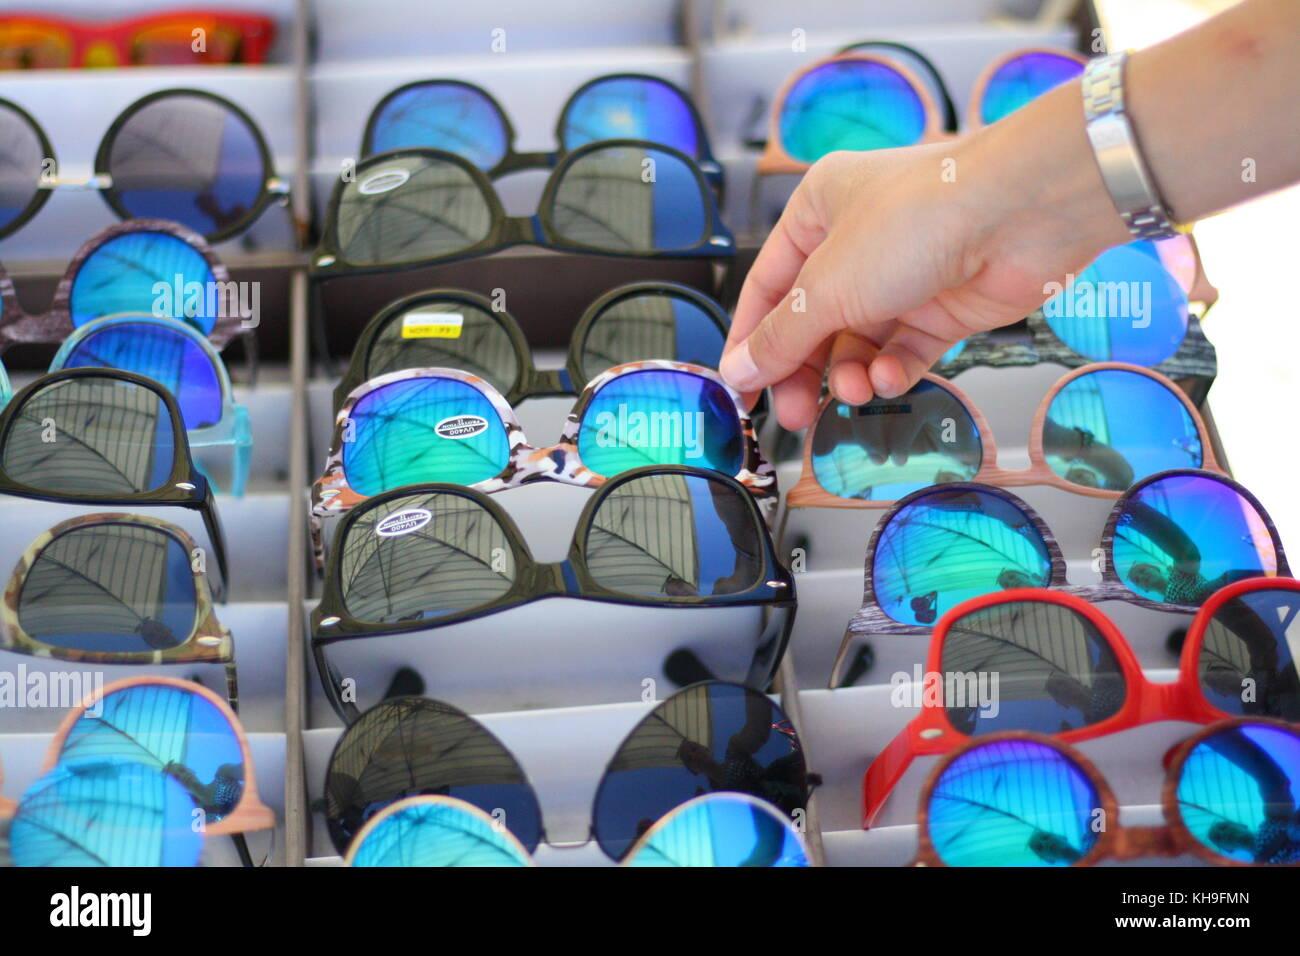 Choosing a cheap sunglass at a street market vendror. - Stock Image